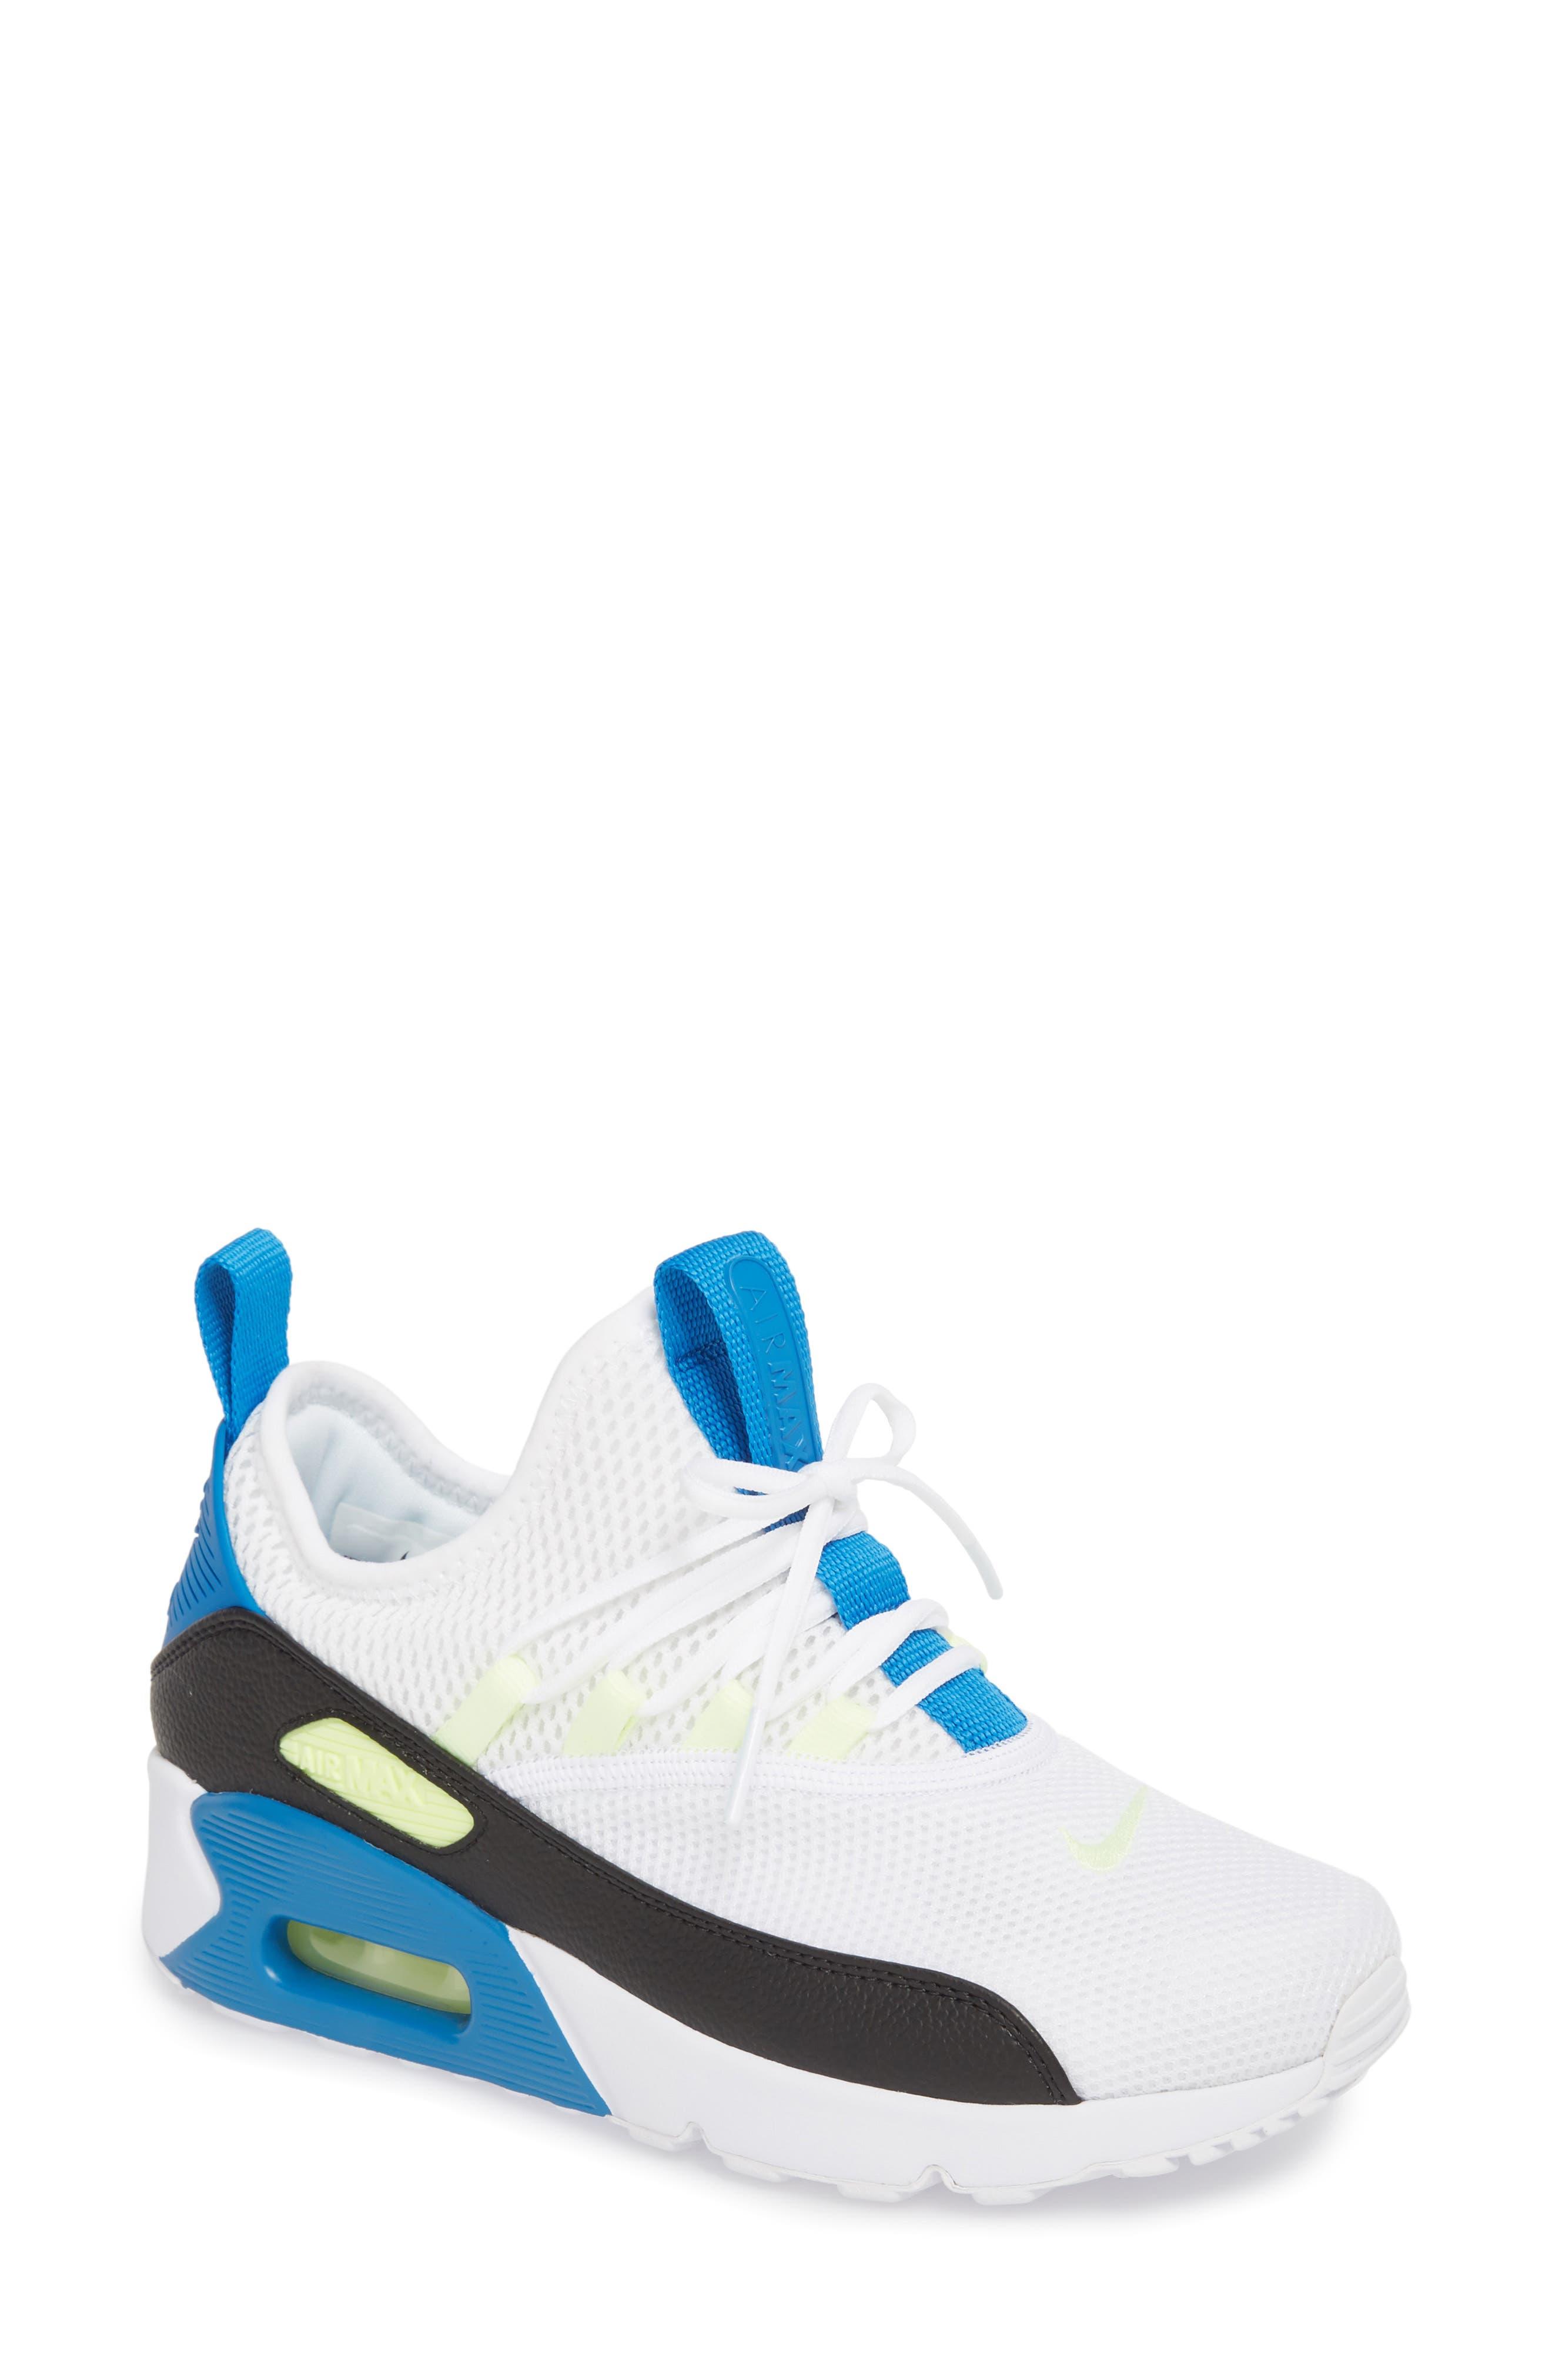 Air Max 90 EZ Sneaker,                         Main,                         color, WHITE/ BLACK/ BLUE NEBULA